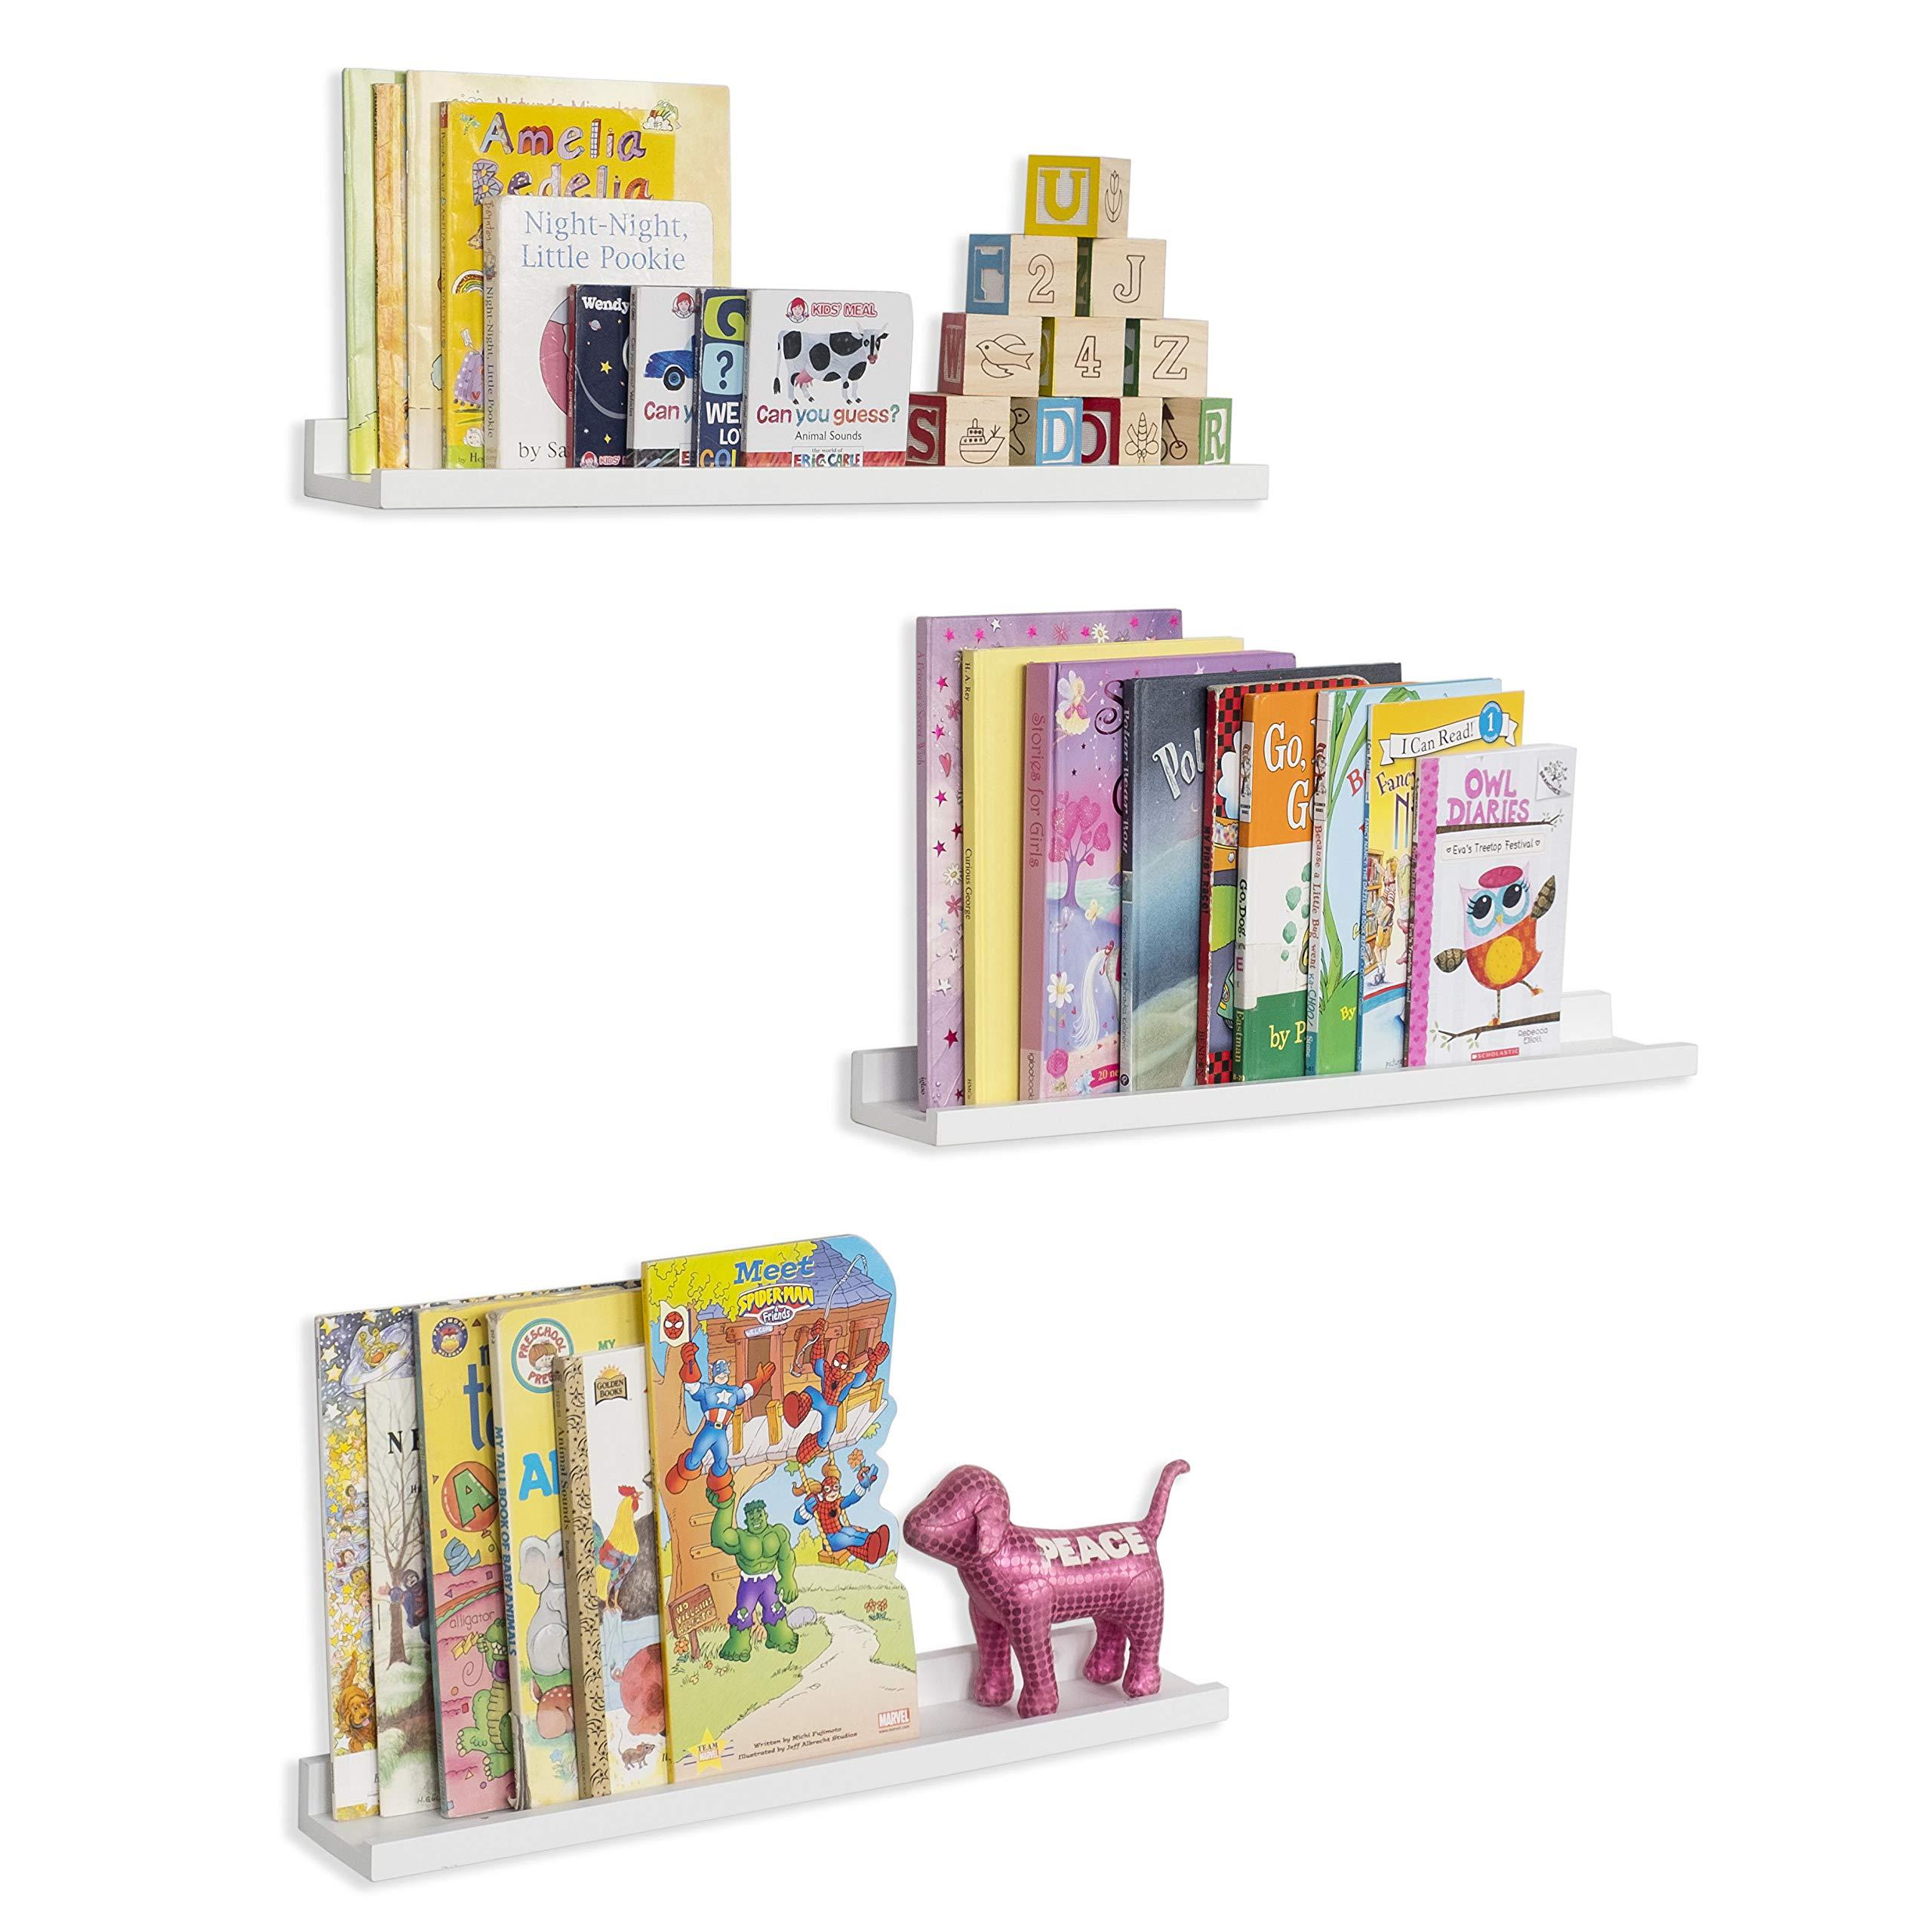 CDM product Wallniture Denver Wall Mounted Floating Shelves for Nursery Decor - Kid's Room Bookshelf Display - Picture Ledge White 22 Inch Set of 3 big image